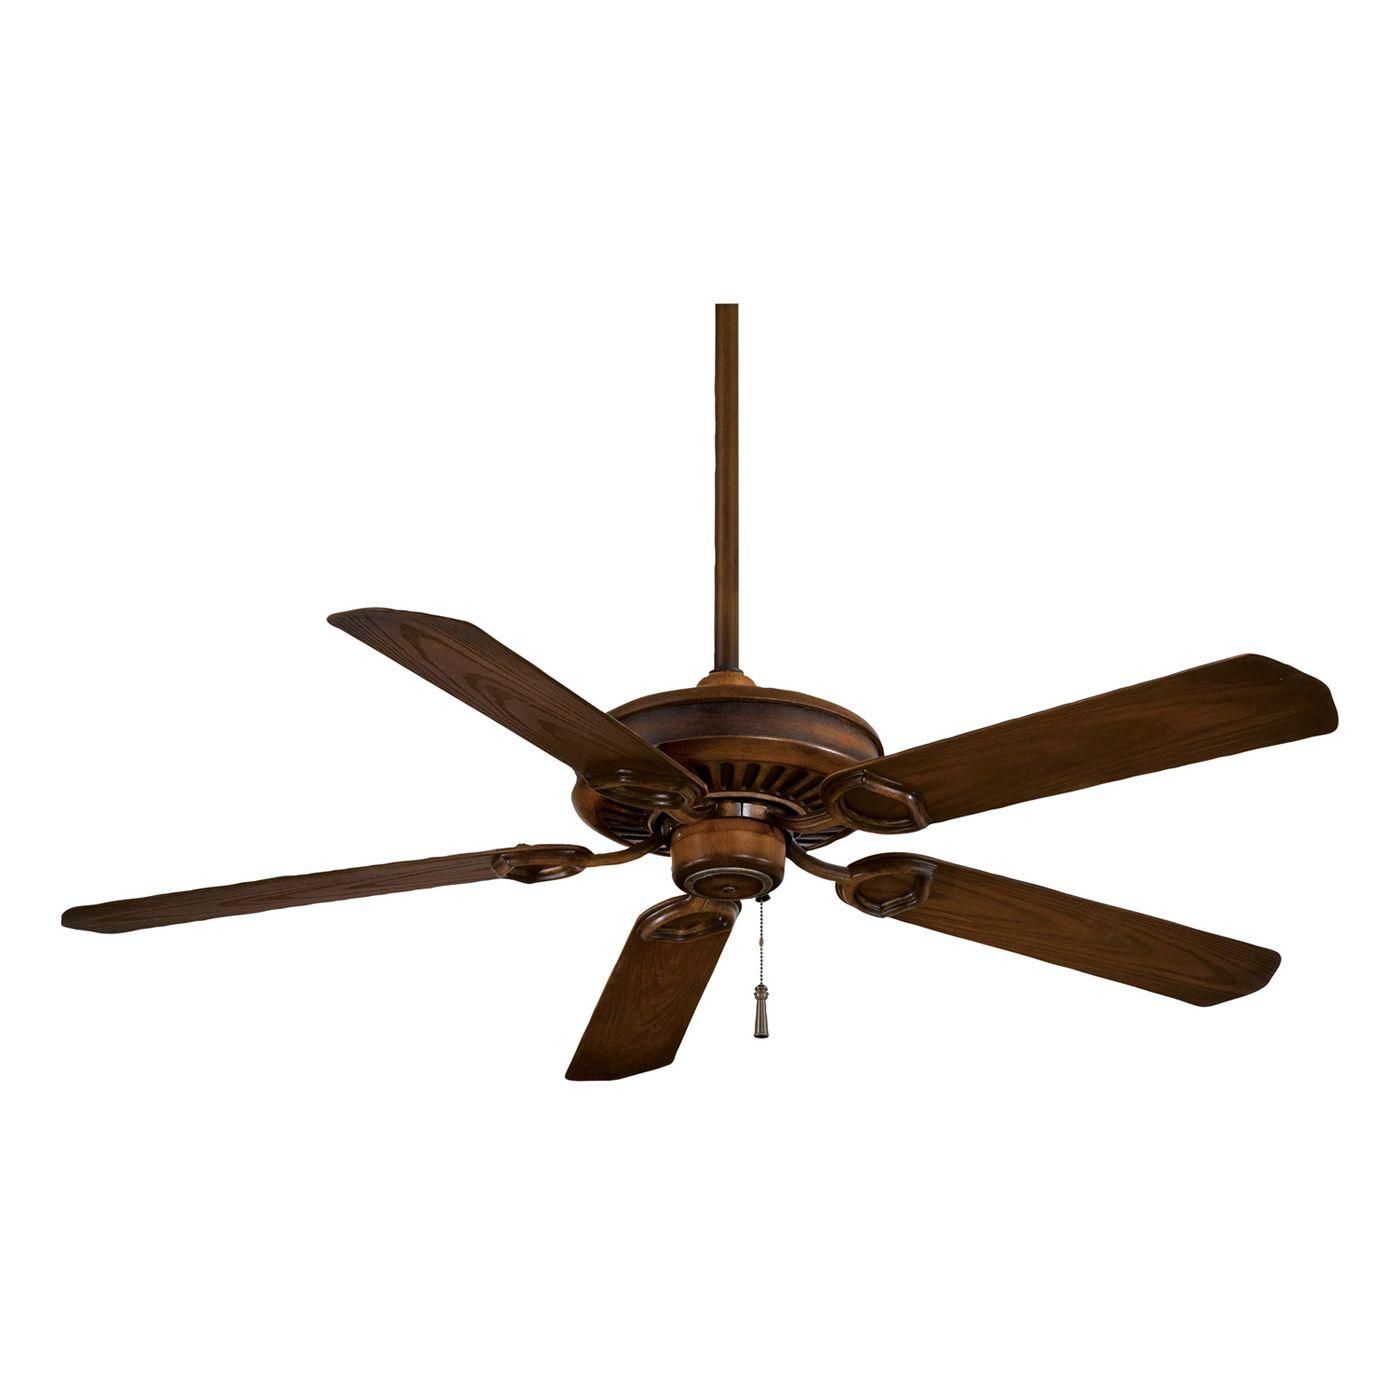 Minka aire f589 54 in sundowner weatherproof ceiling fan at atg minka aire f589 54 in sundowner weatherproof ceiling fan at atg stores aloadofball Image collections